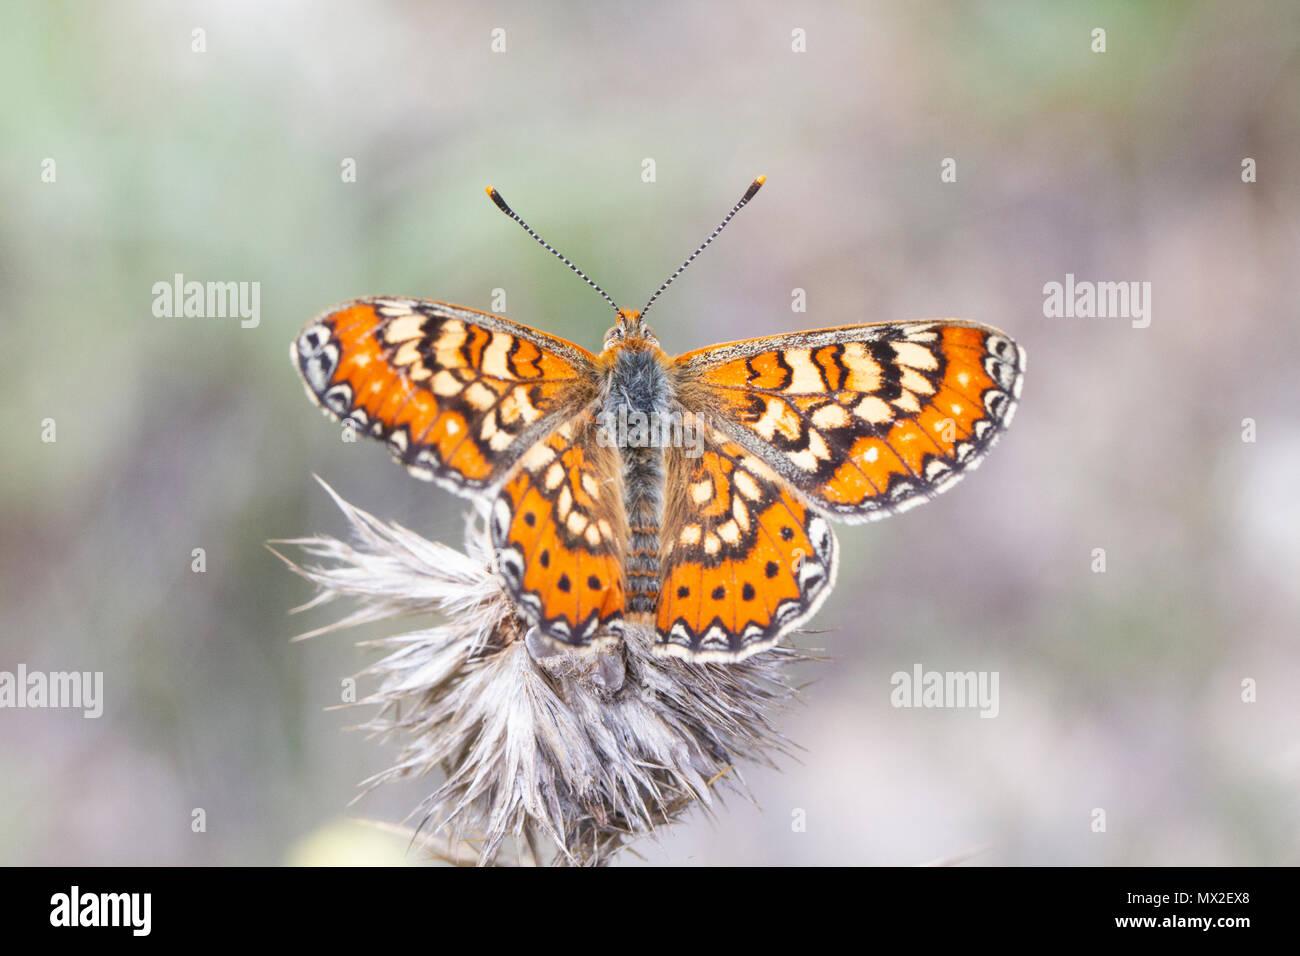 {Schmetterling Euphydryas desfontainii), Flügel geöffnet. Stockbild